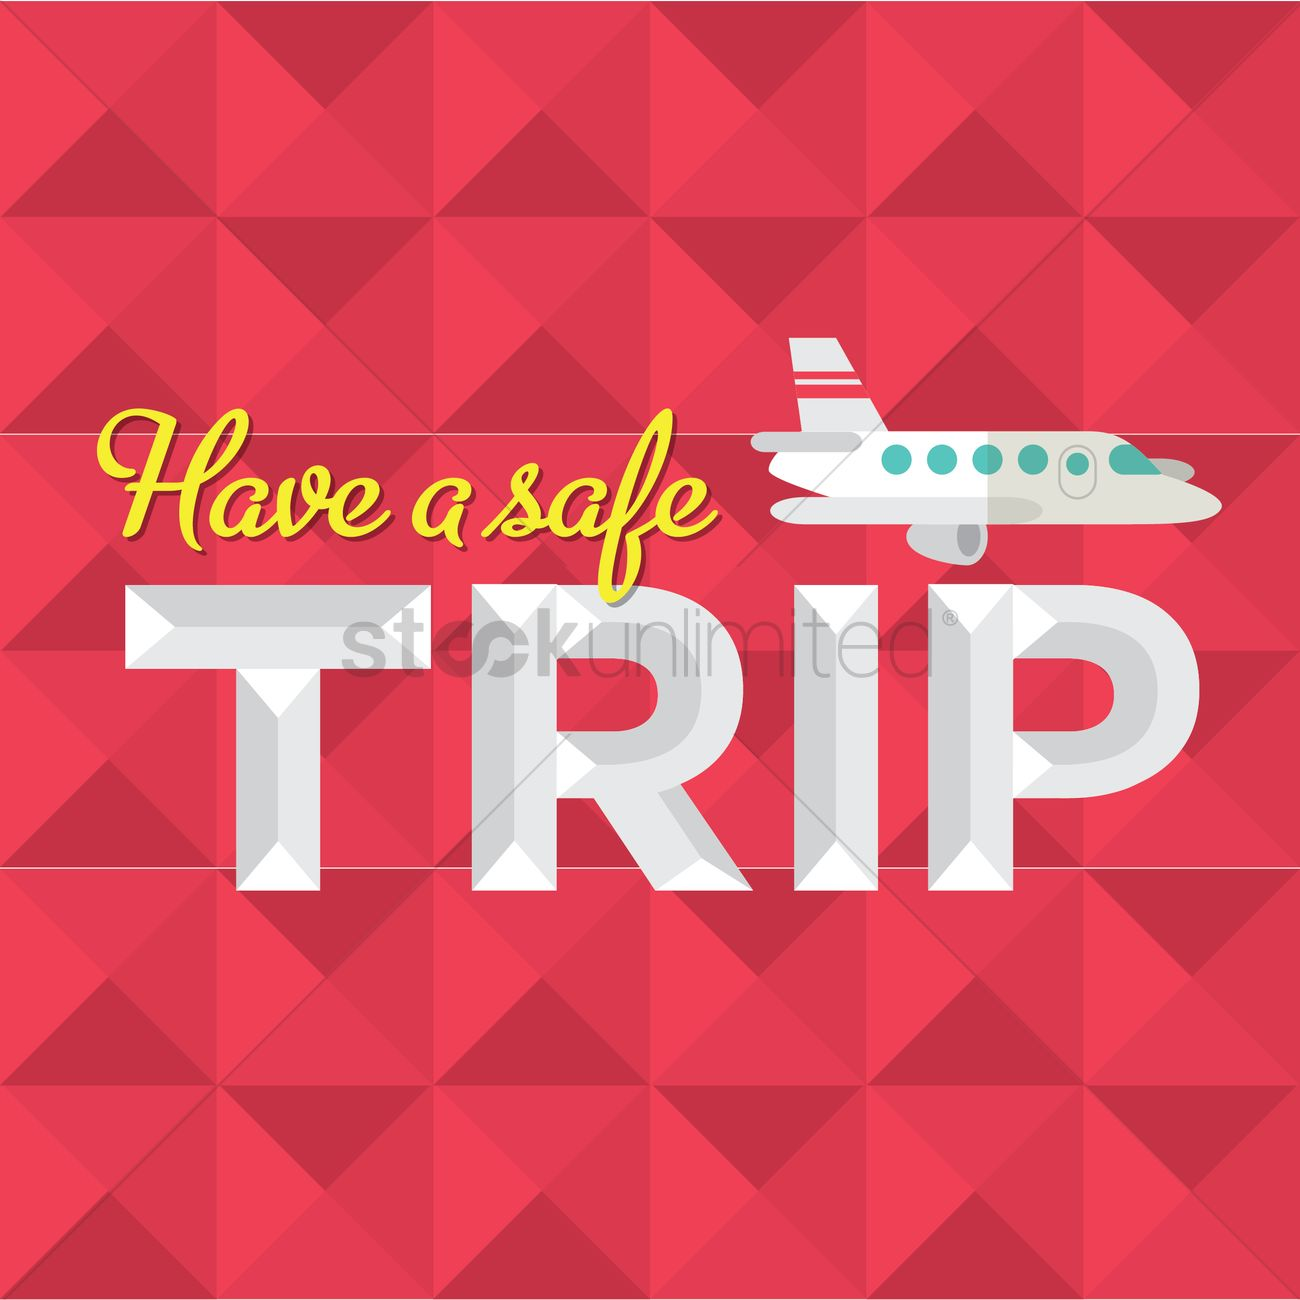 Is Cape Verde Safe For Travel